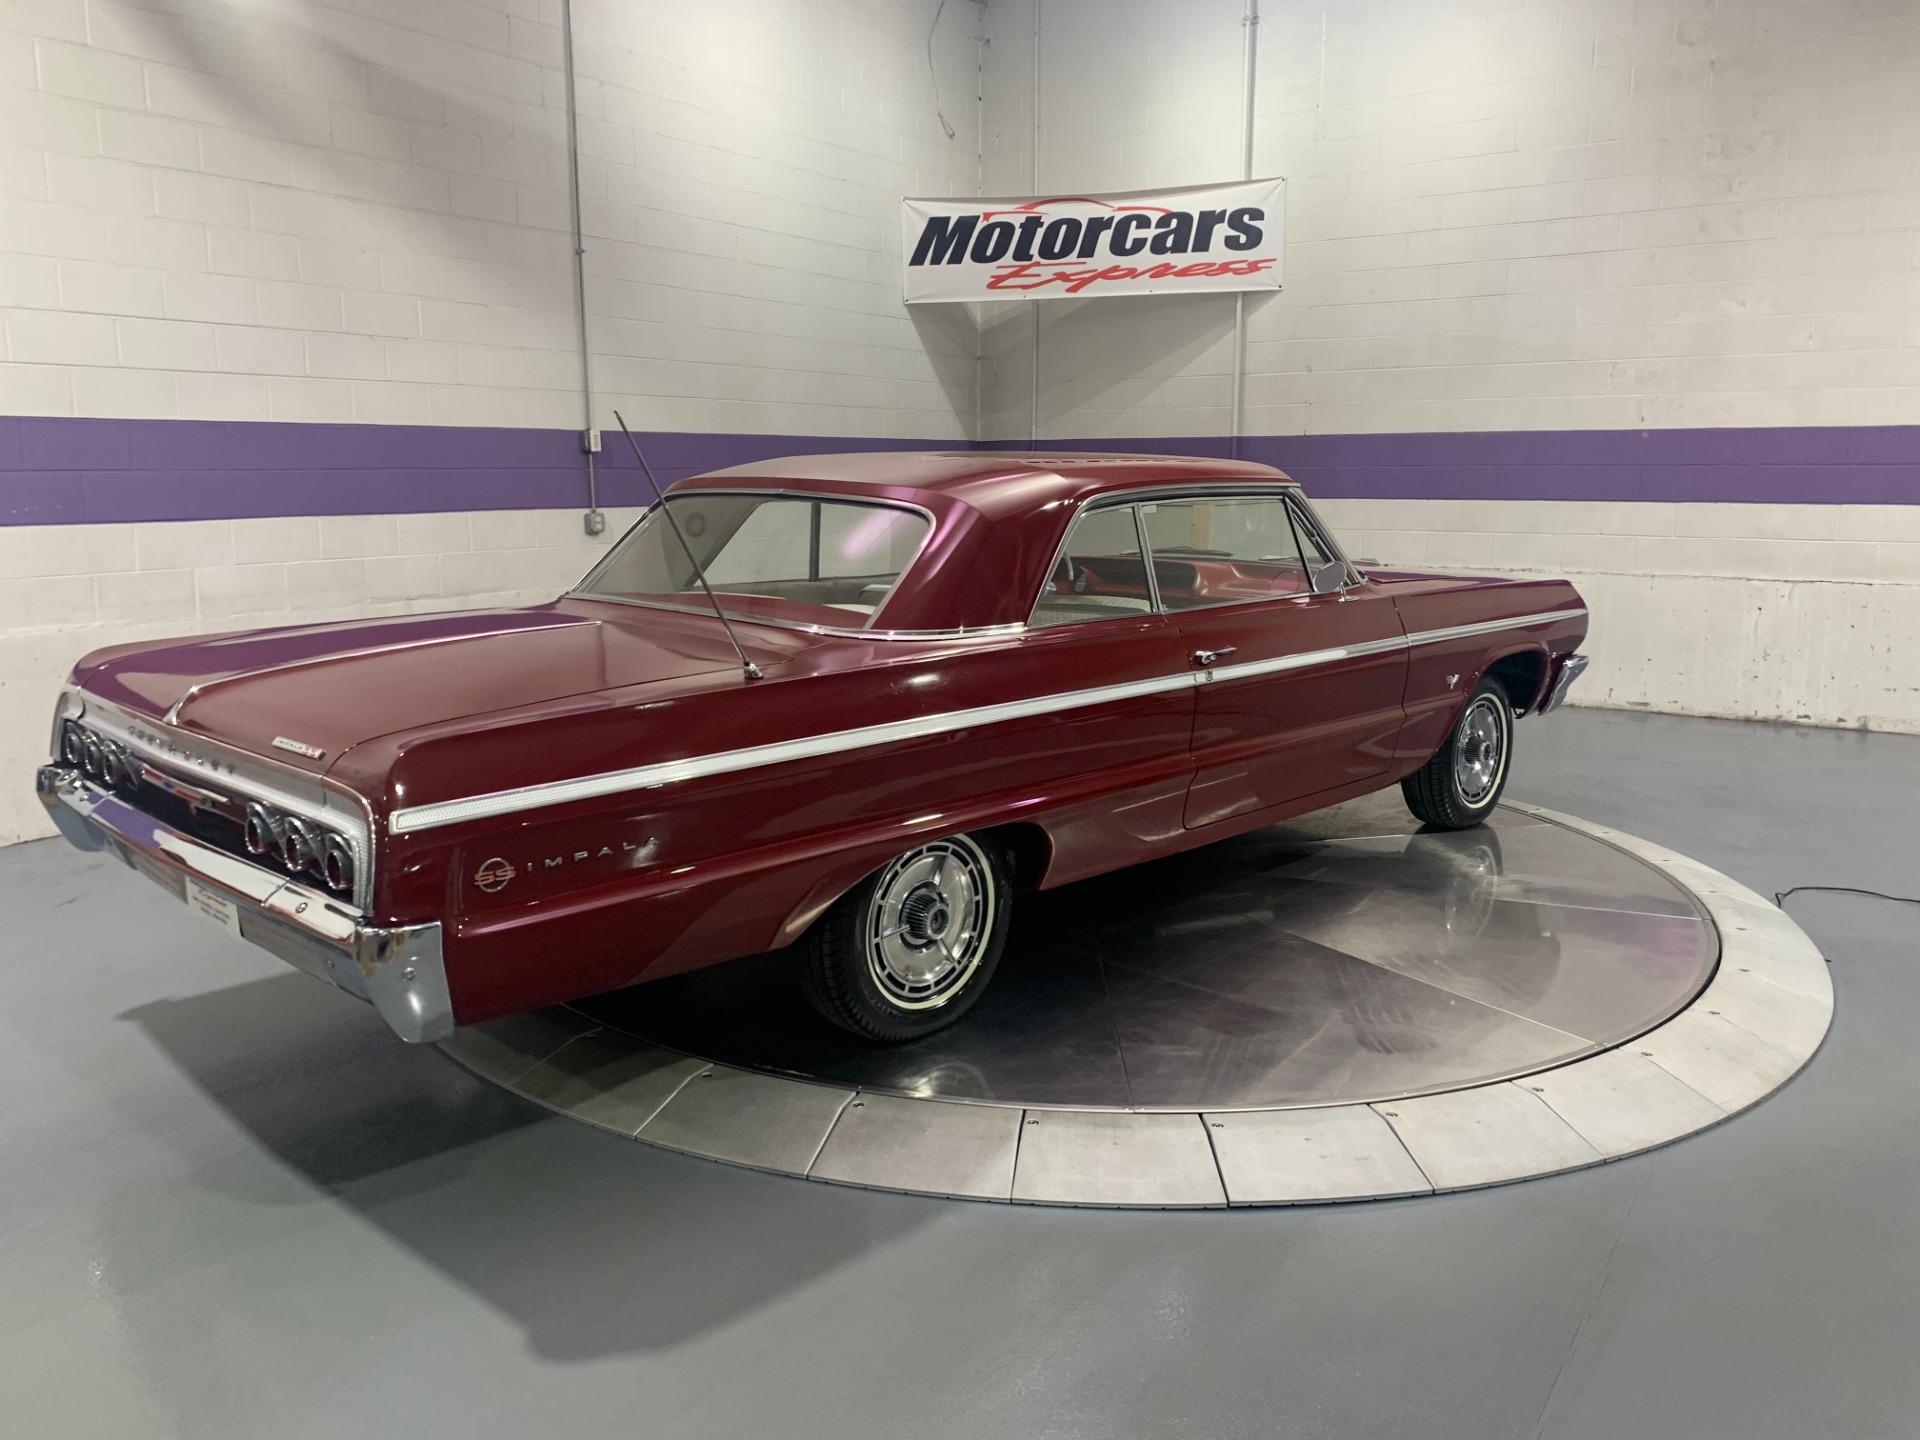 Used-1964-Chevrolet-Impala-True-SS-327-4-Speed